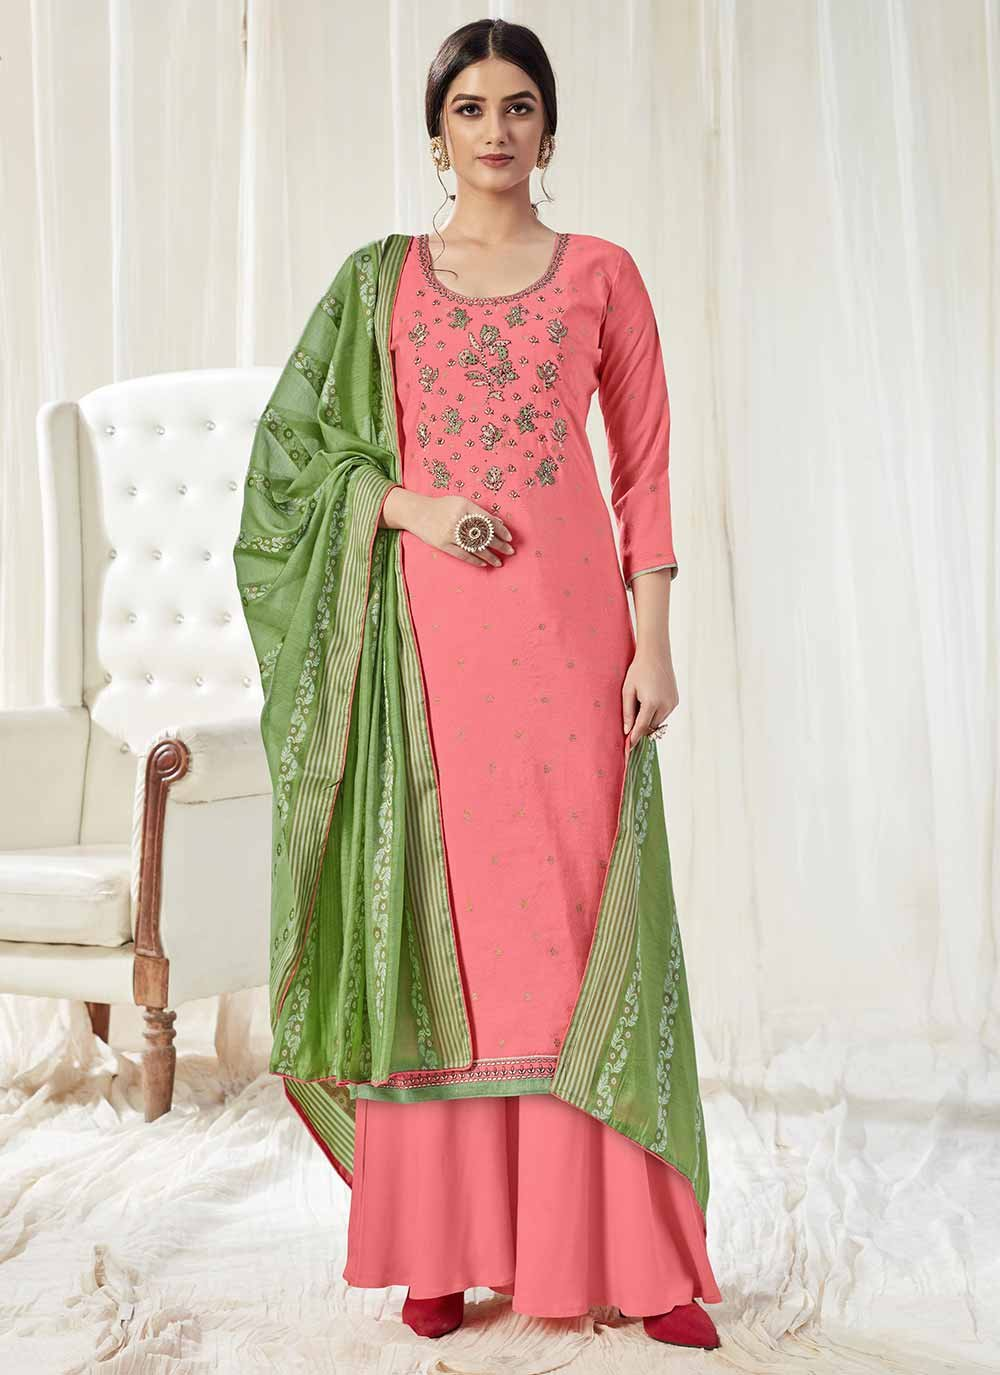 Embroidered Trendy Pakistani Salwar Kameez